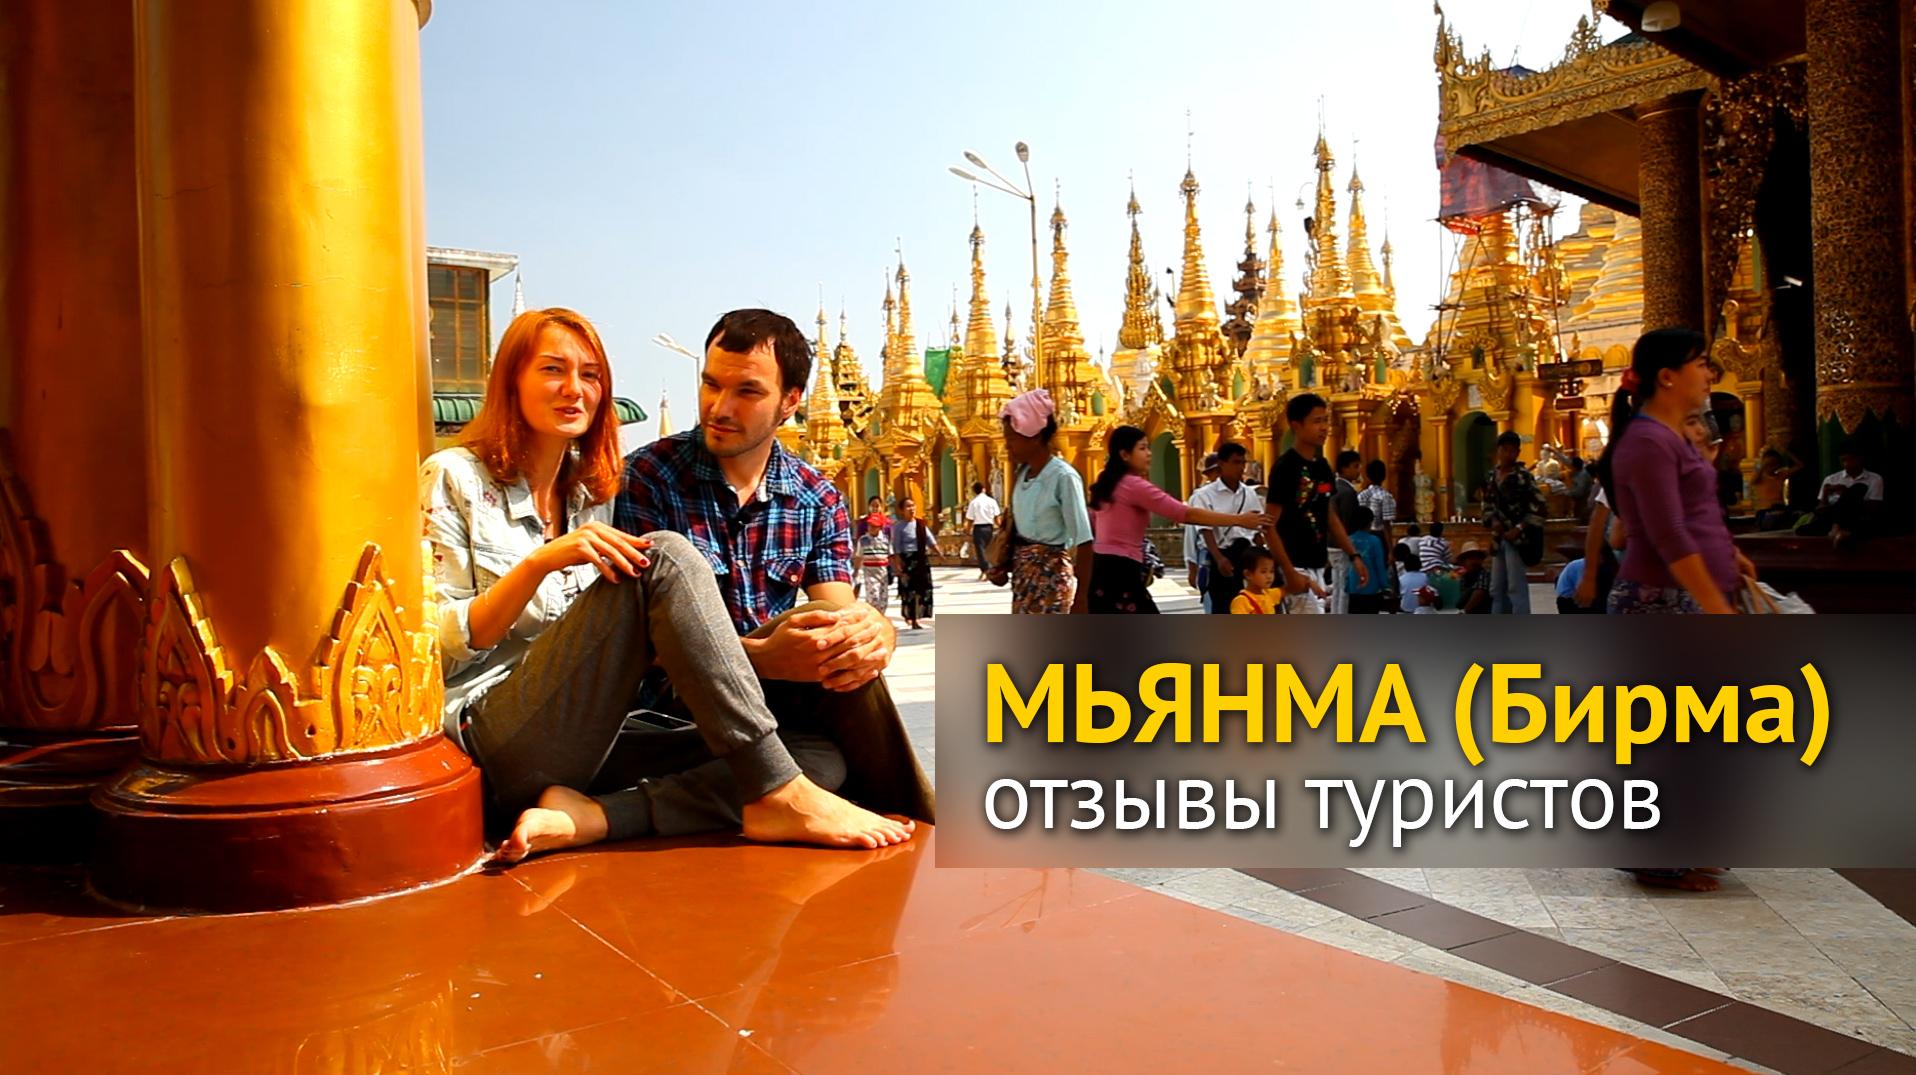 Мьянма, Бирма, отзывы